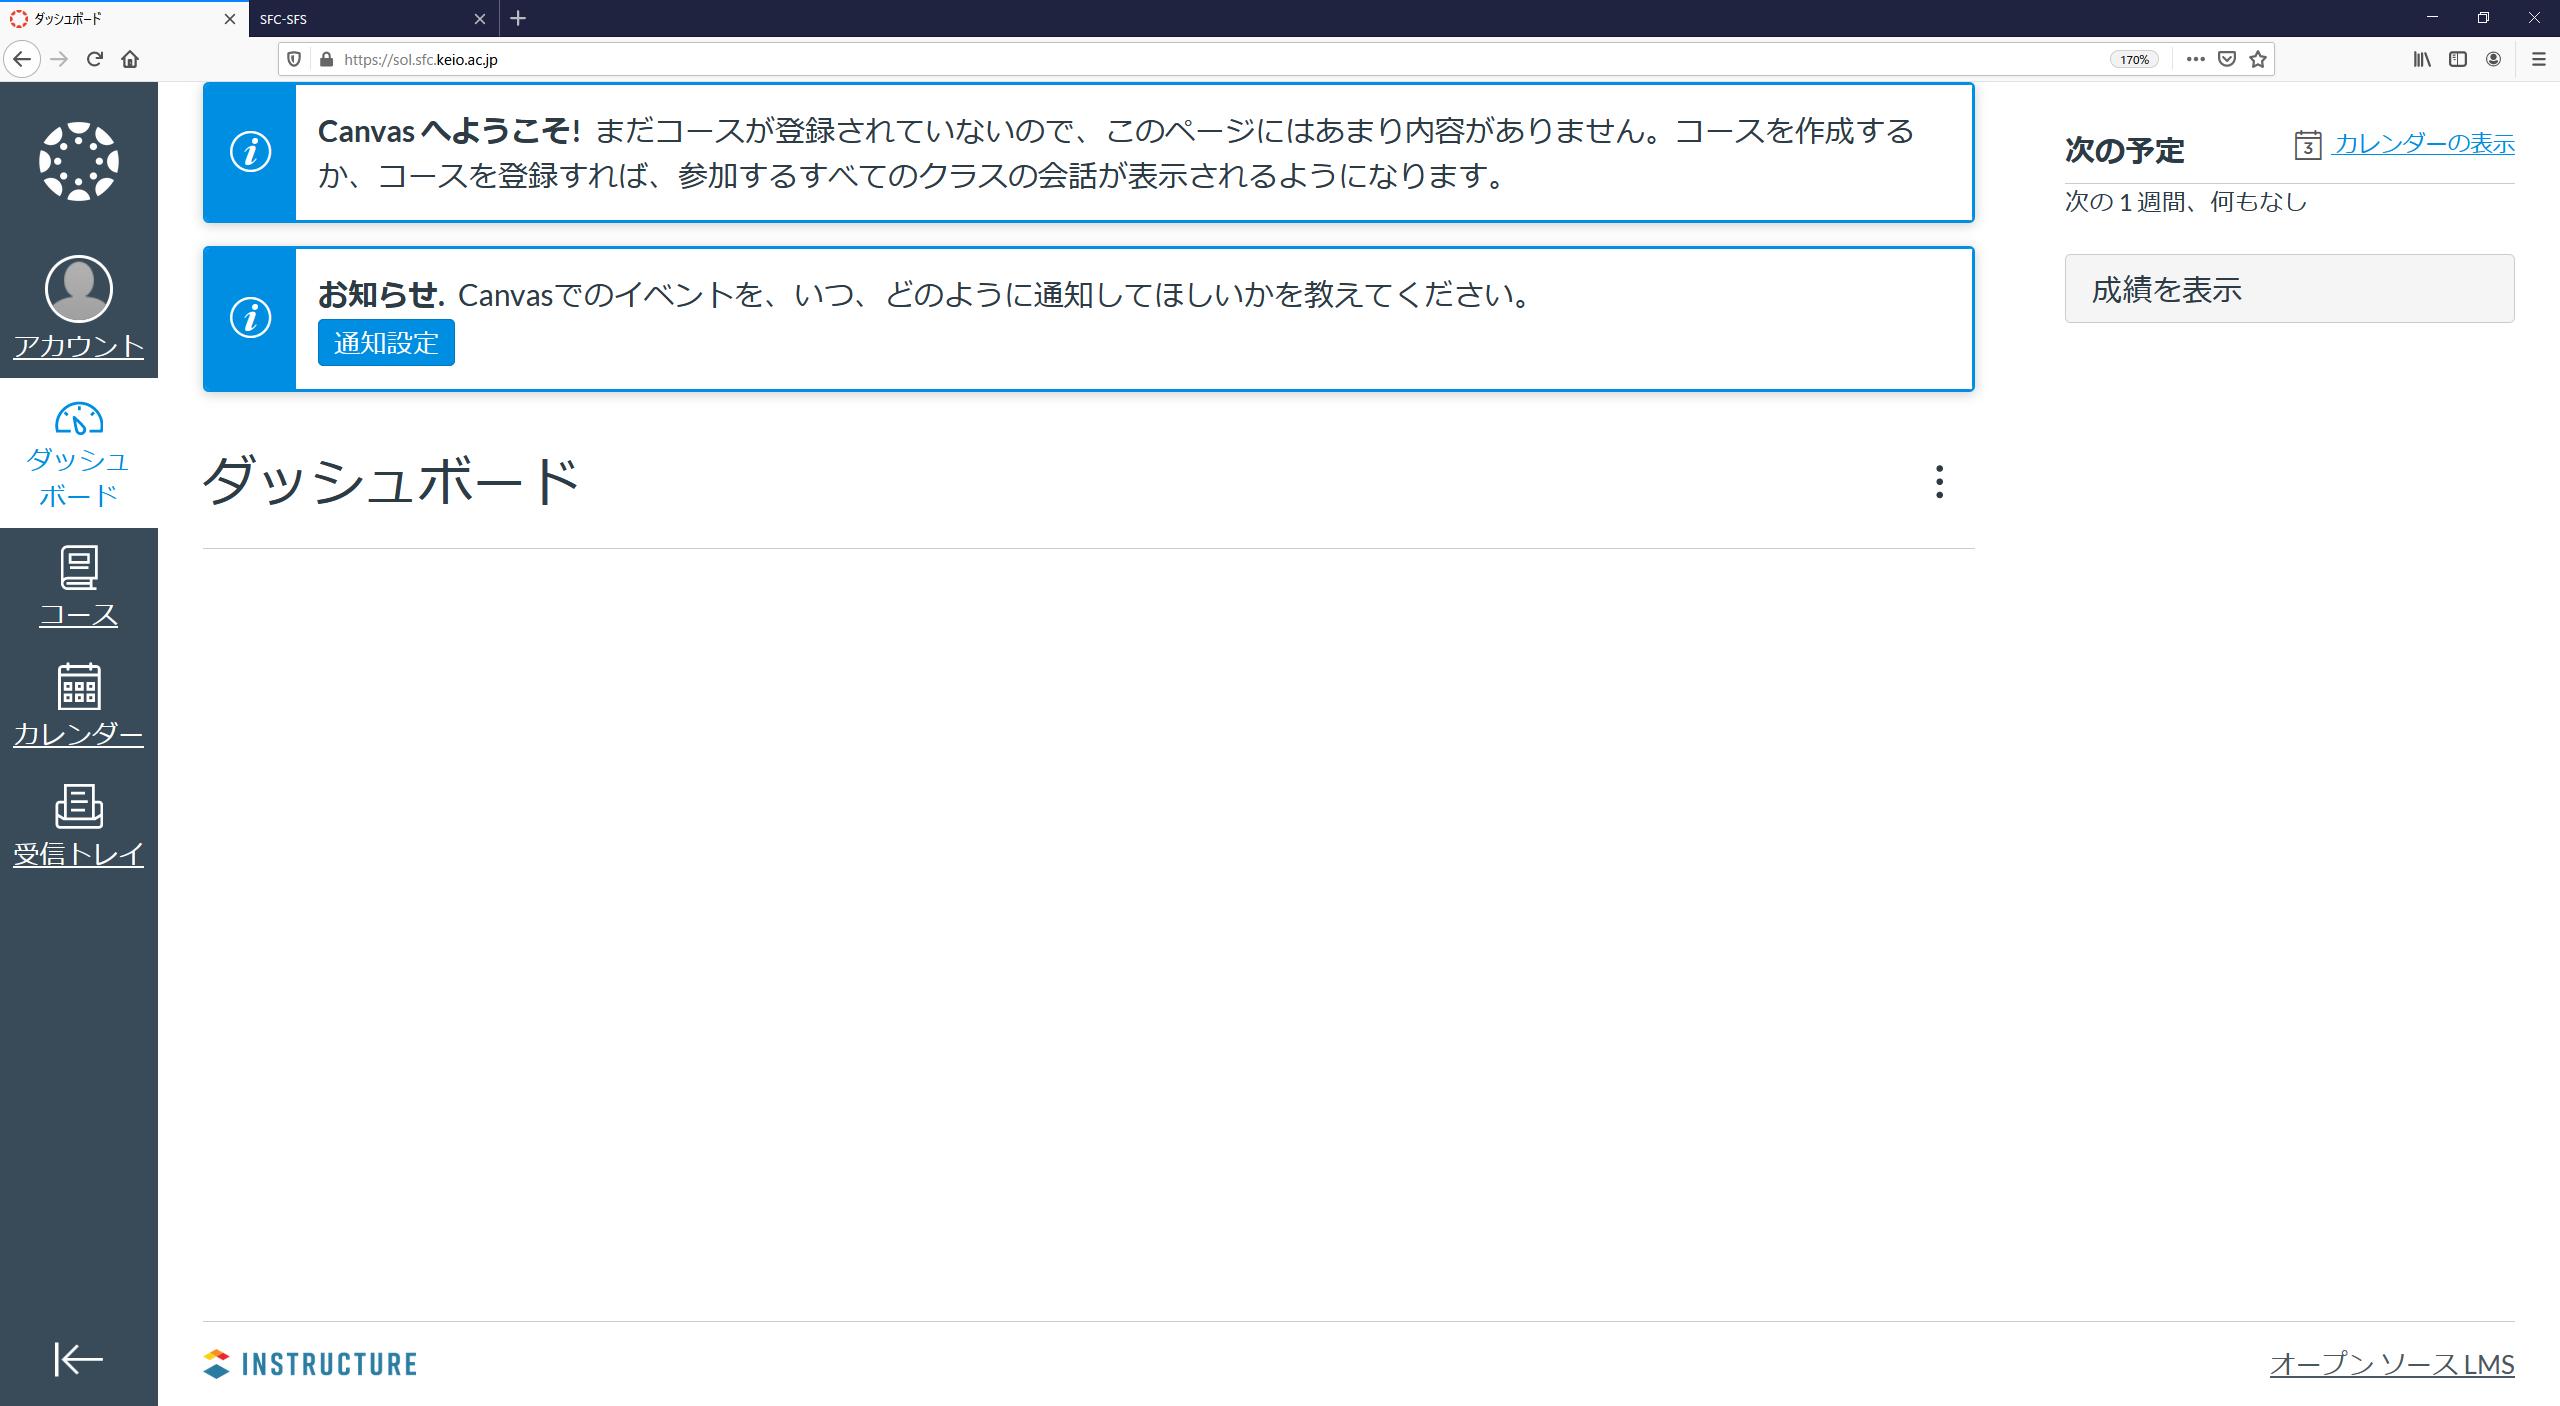 SOLのトップページ 初期状態では学生証の顔写真が表示される